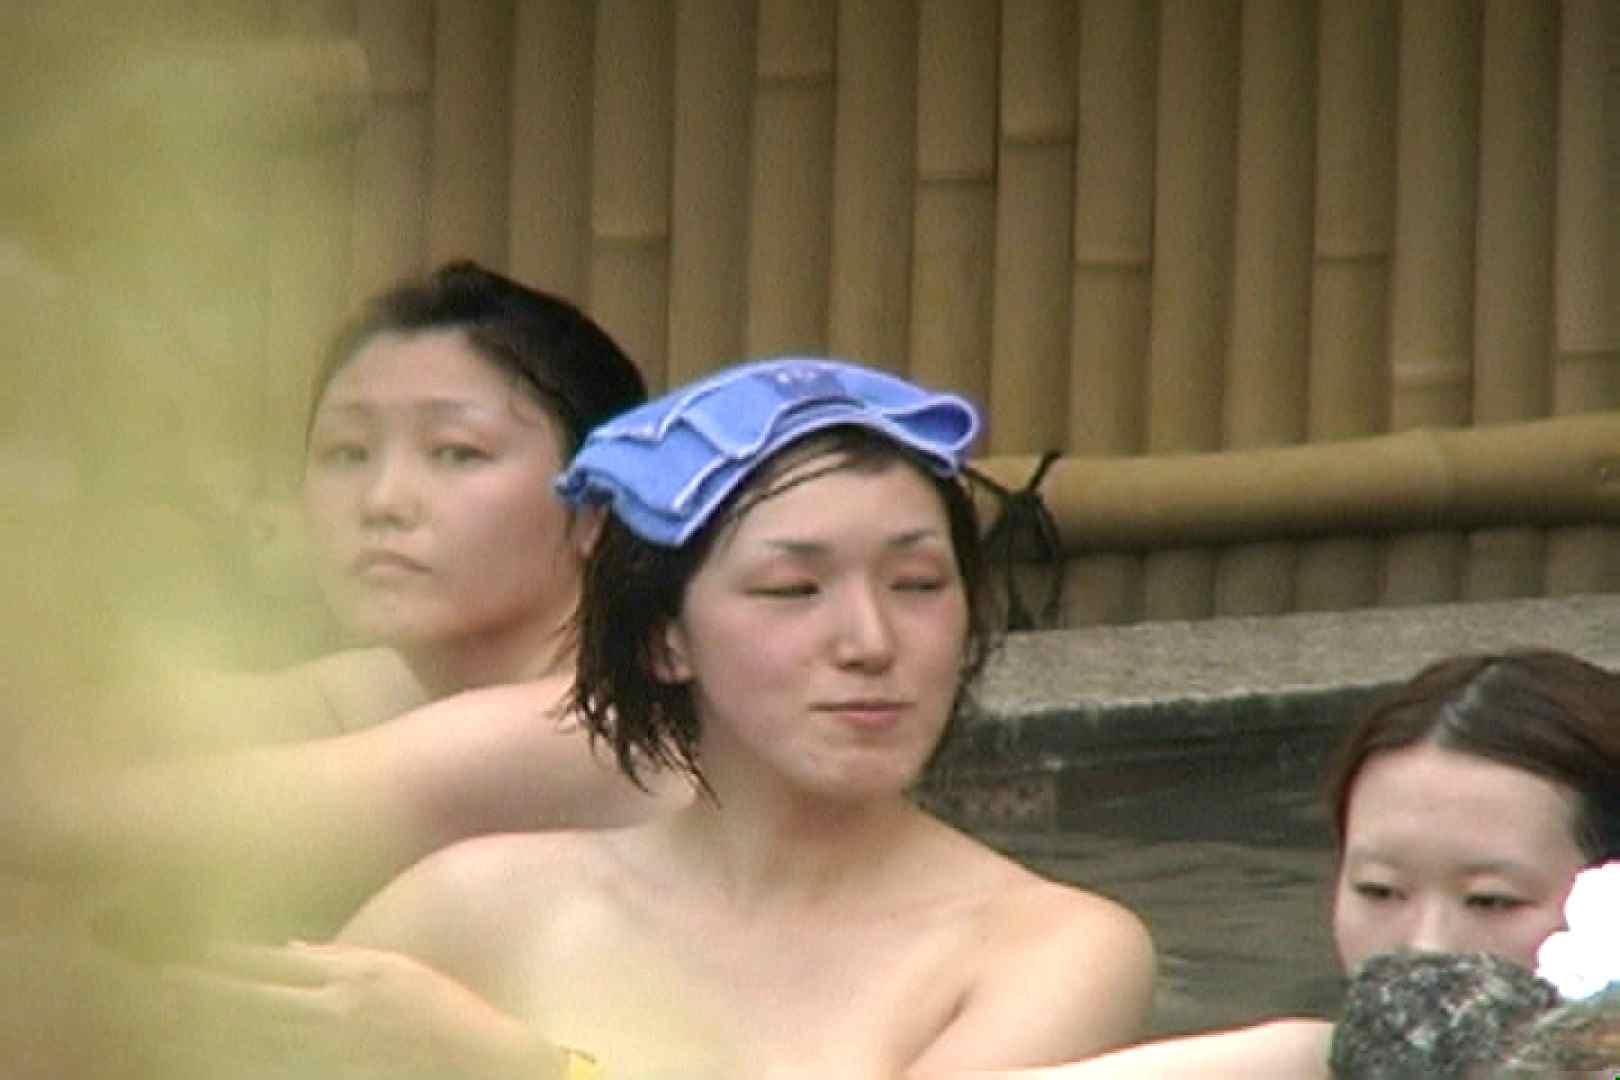 Aquaな露天風呂Vol.109 露天風呂編  88PIX 4